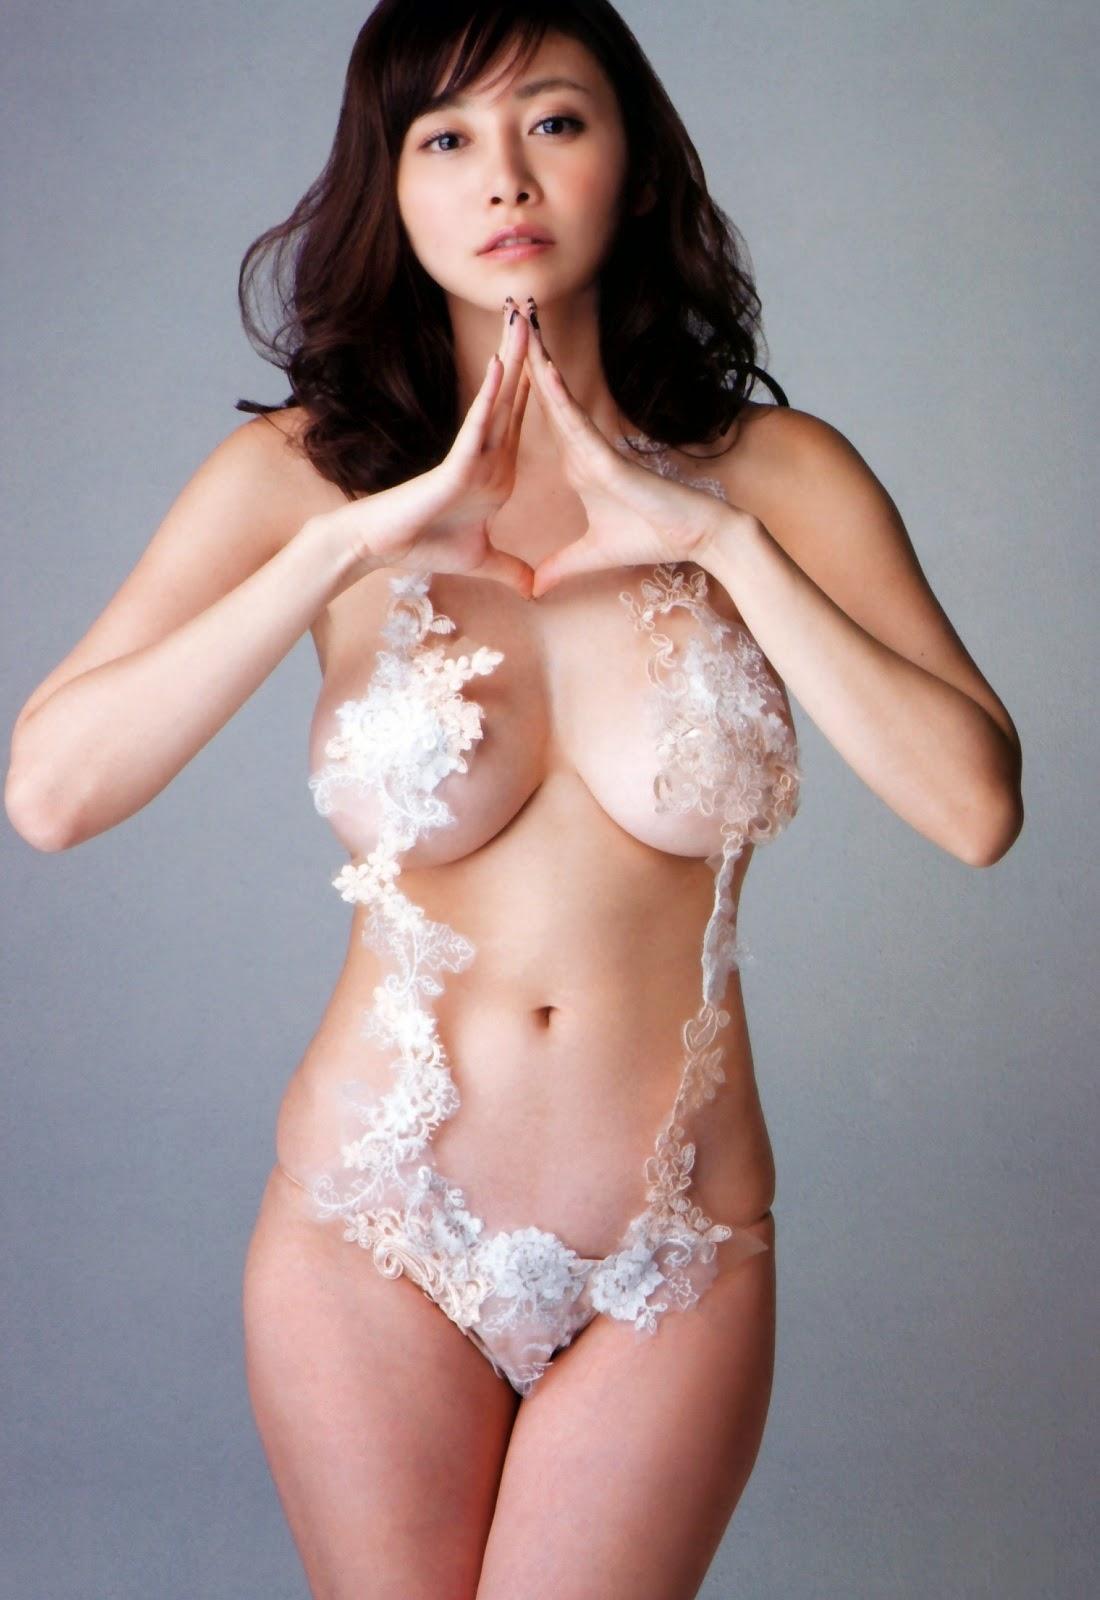 Anri-sugihara nude